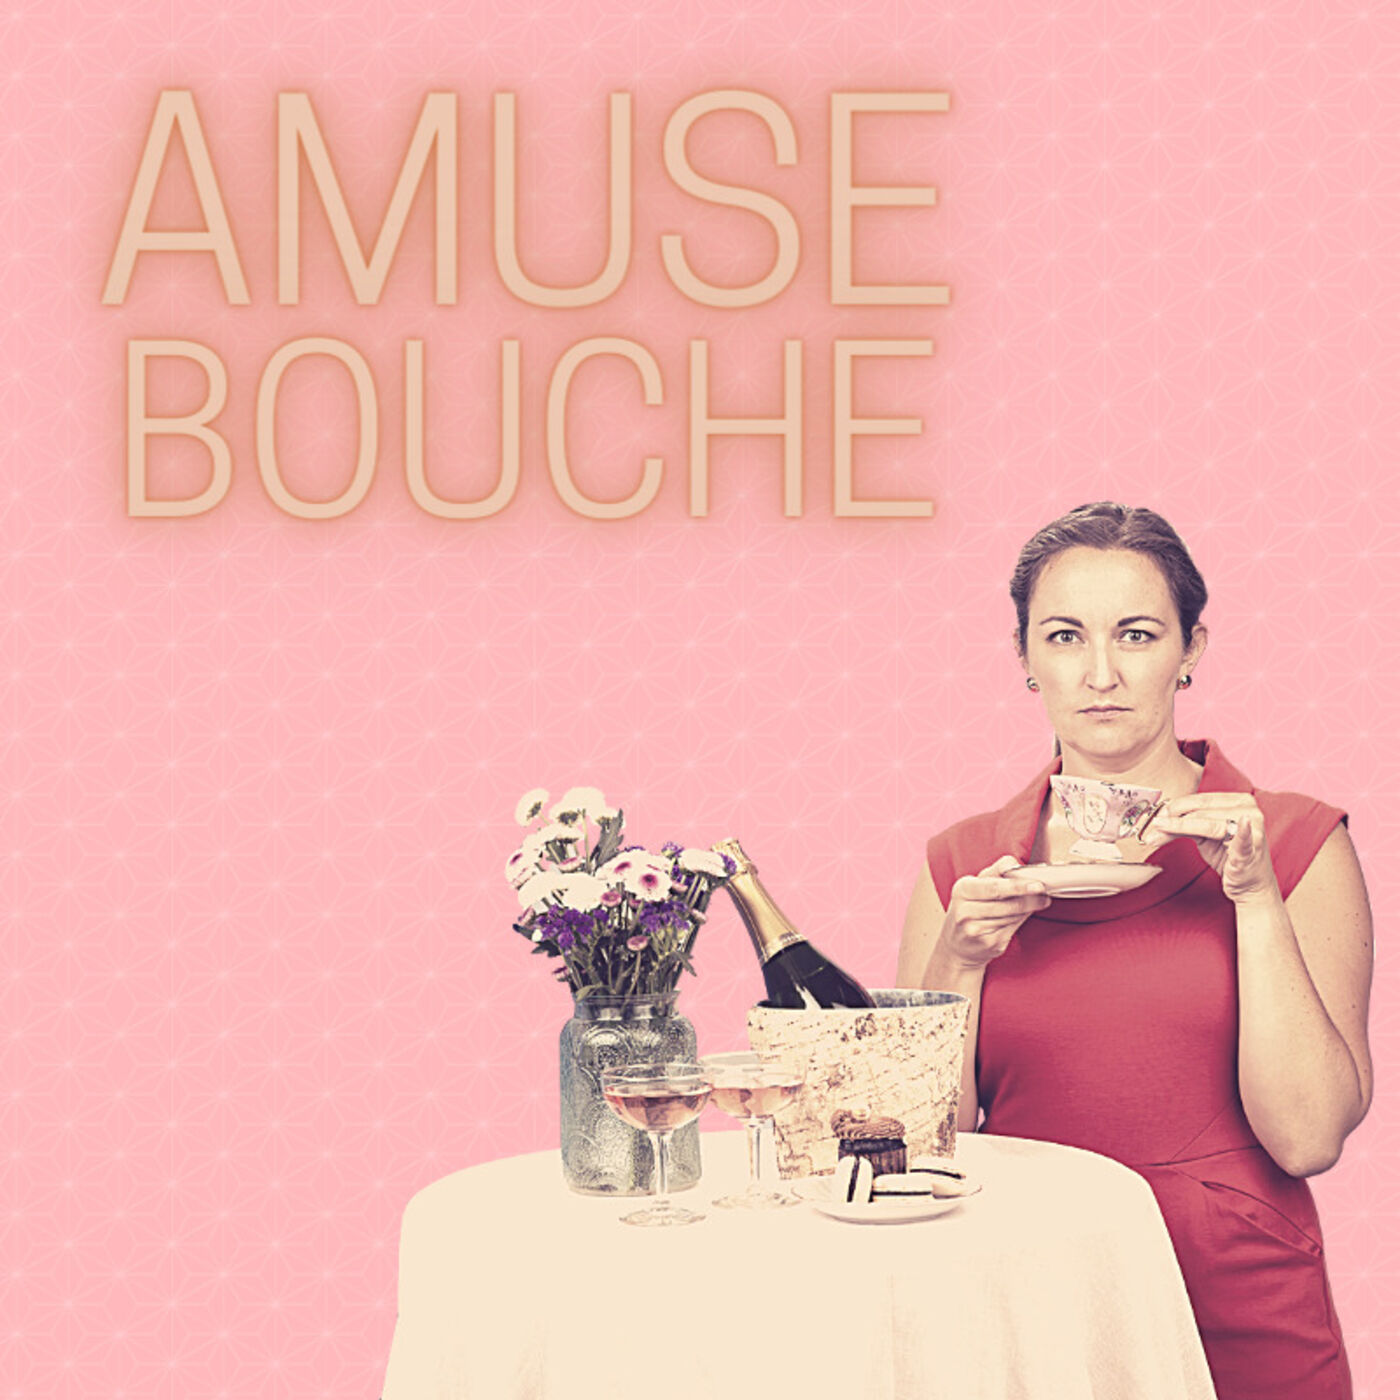 This is Bridget - Amuse Bouche #1